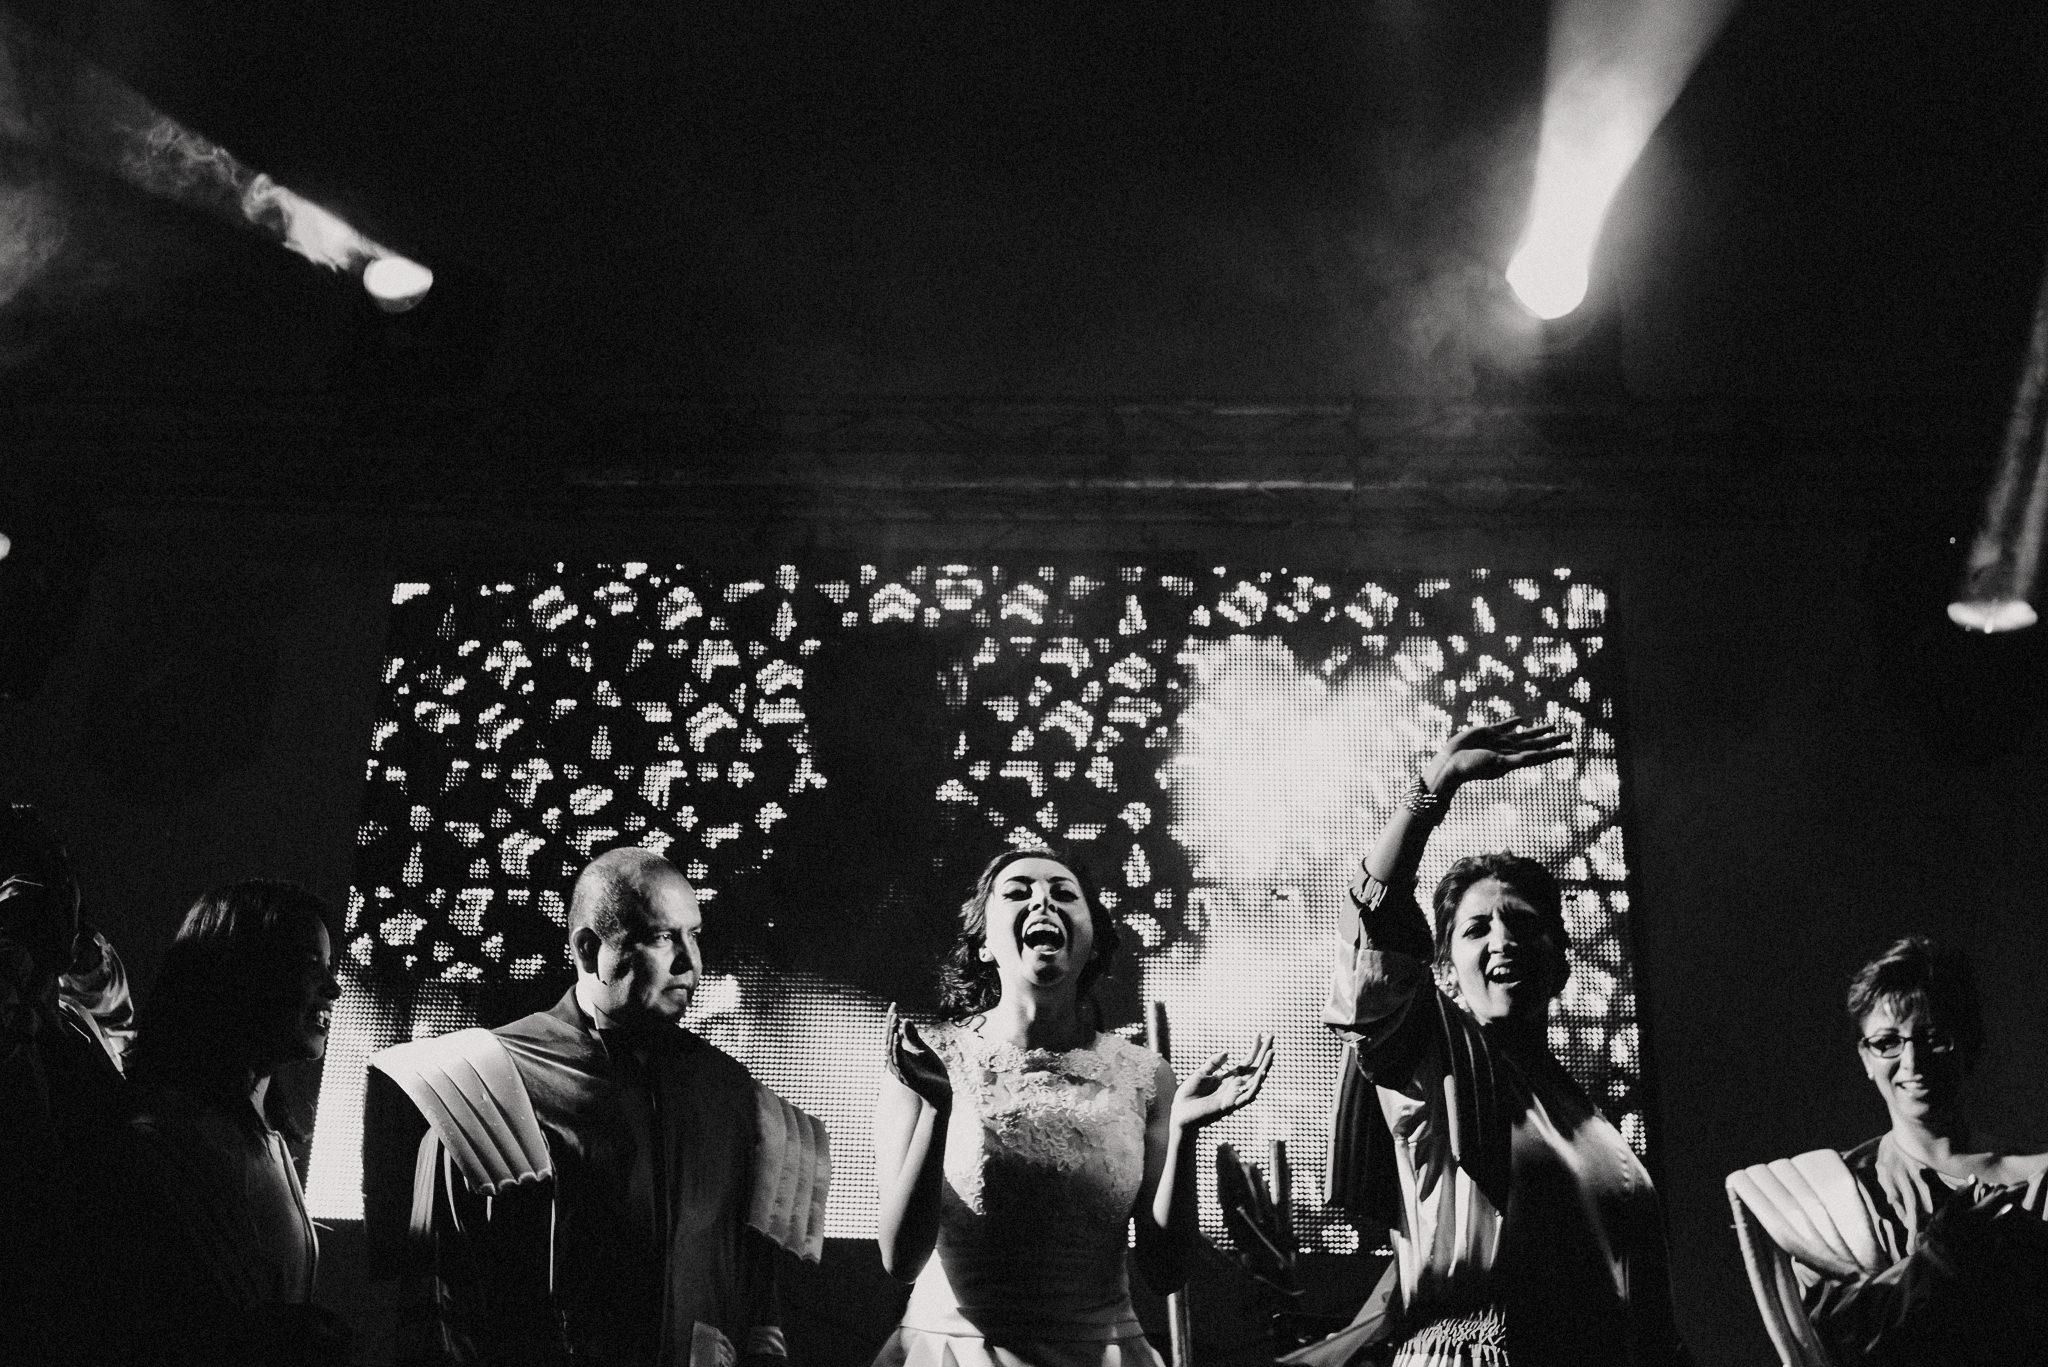 Wedding-Boda-Tulancingo-Hidalgo-Salon-Essenzia-Luis-Houdin-79-film